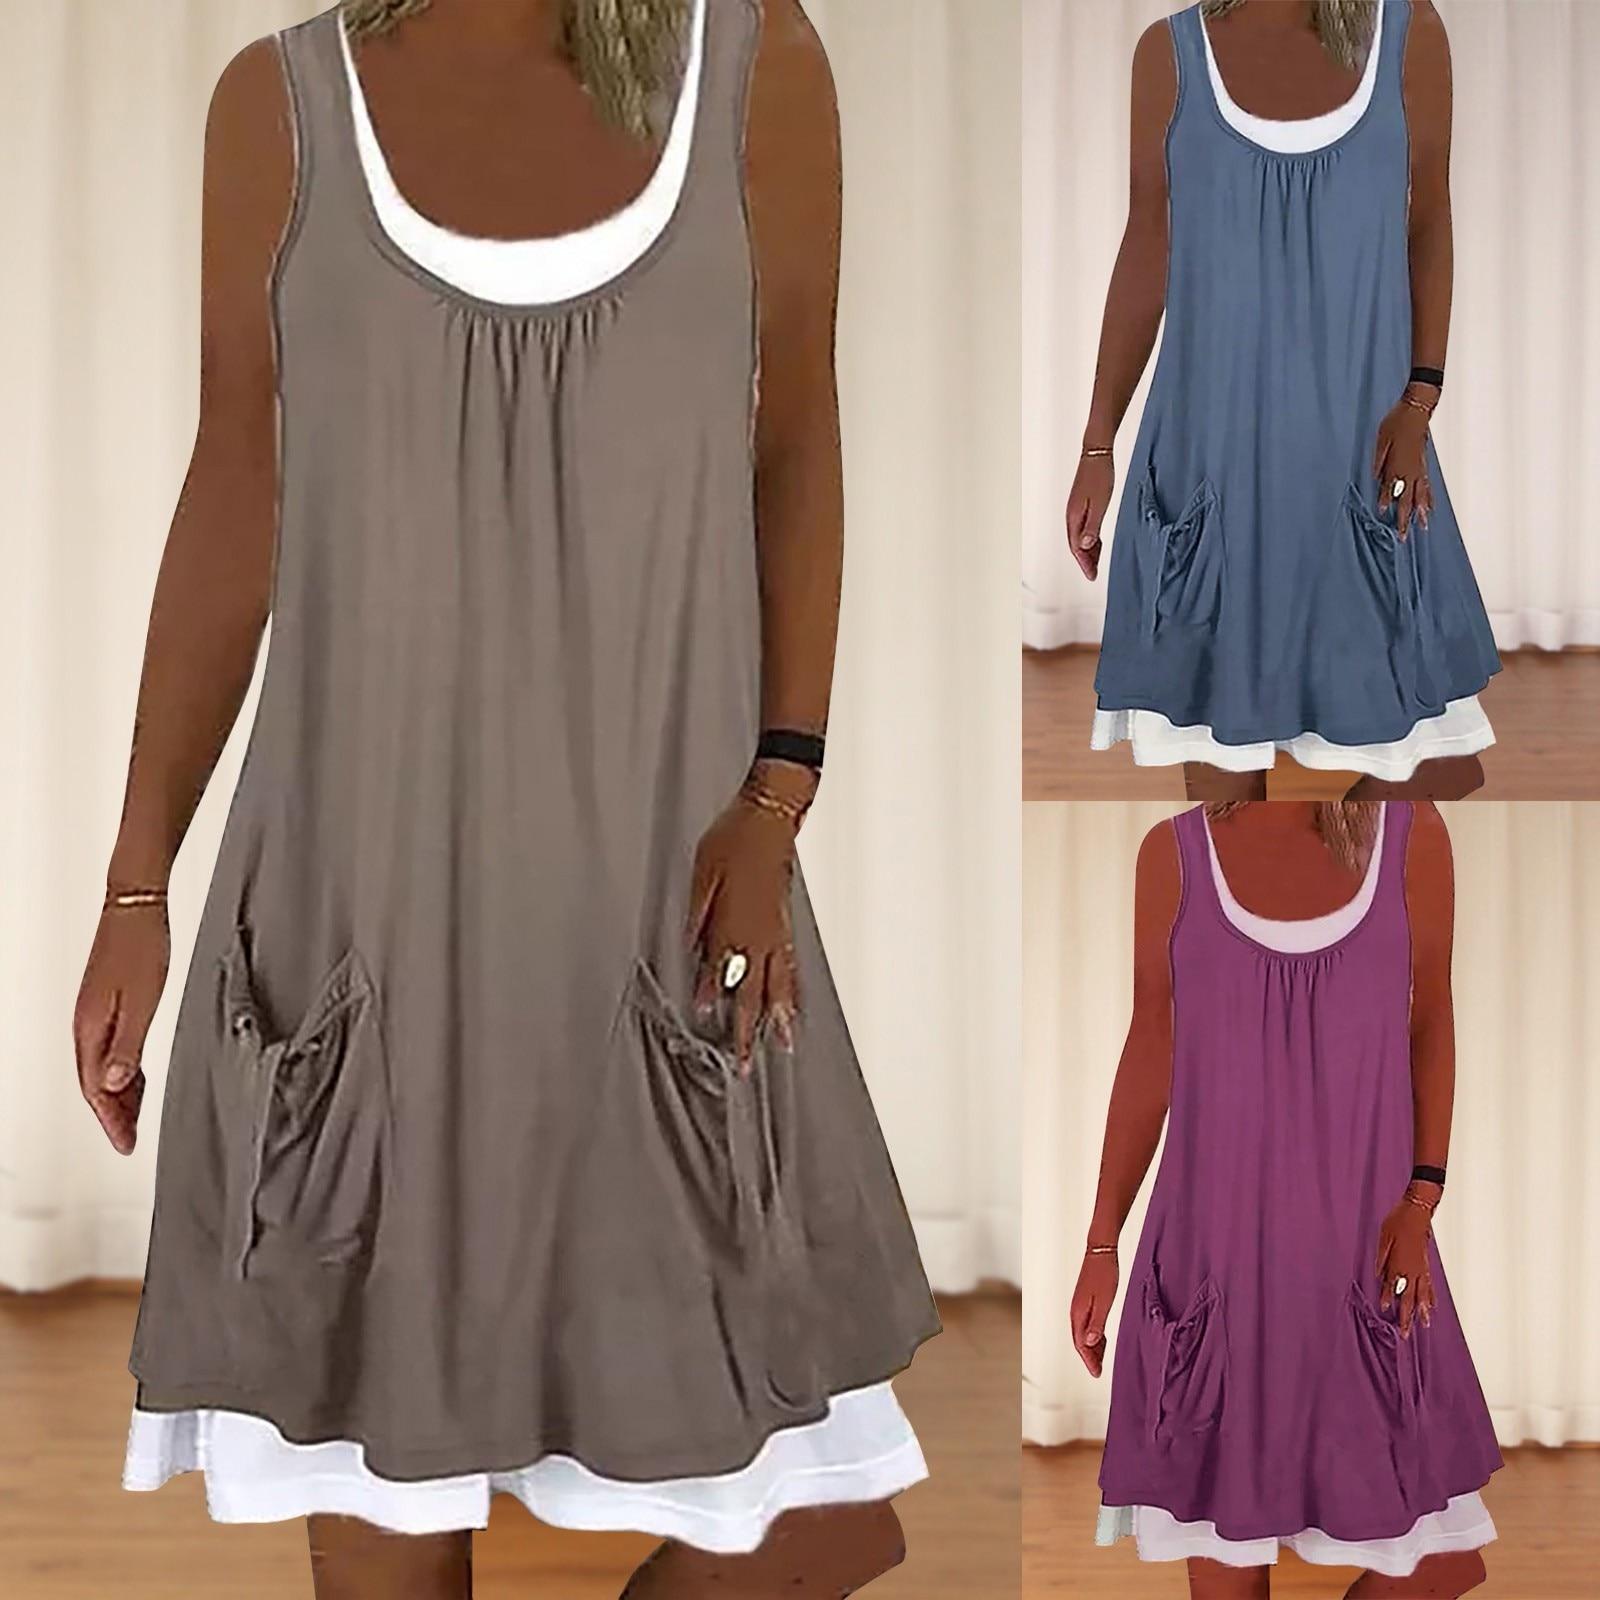 dresses for women 2021 Casual Round Neckline Knee-Length Shift Dress Two-piece Pocket Suit lilly pulitzer women s estrada shift dress